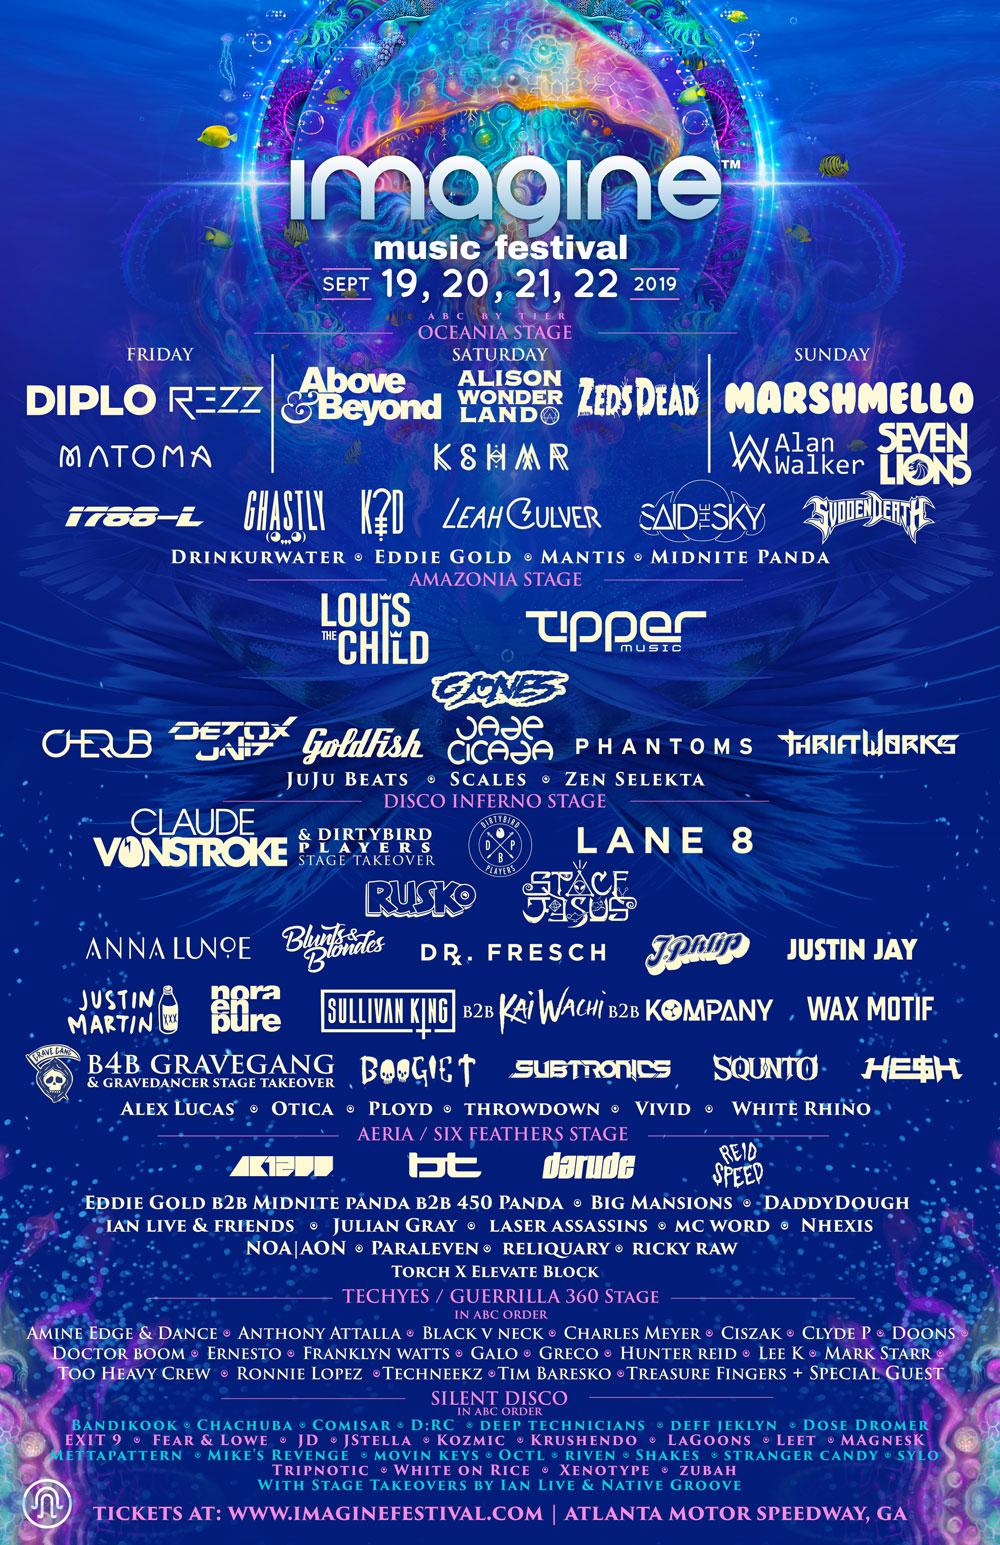 9.20 Imagine Music Festival Atlanta Motor Speedway Atlanta EDM Events Shows Concerts Festivals 2019.jpg